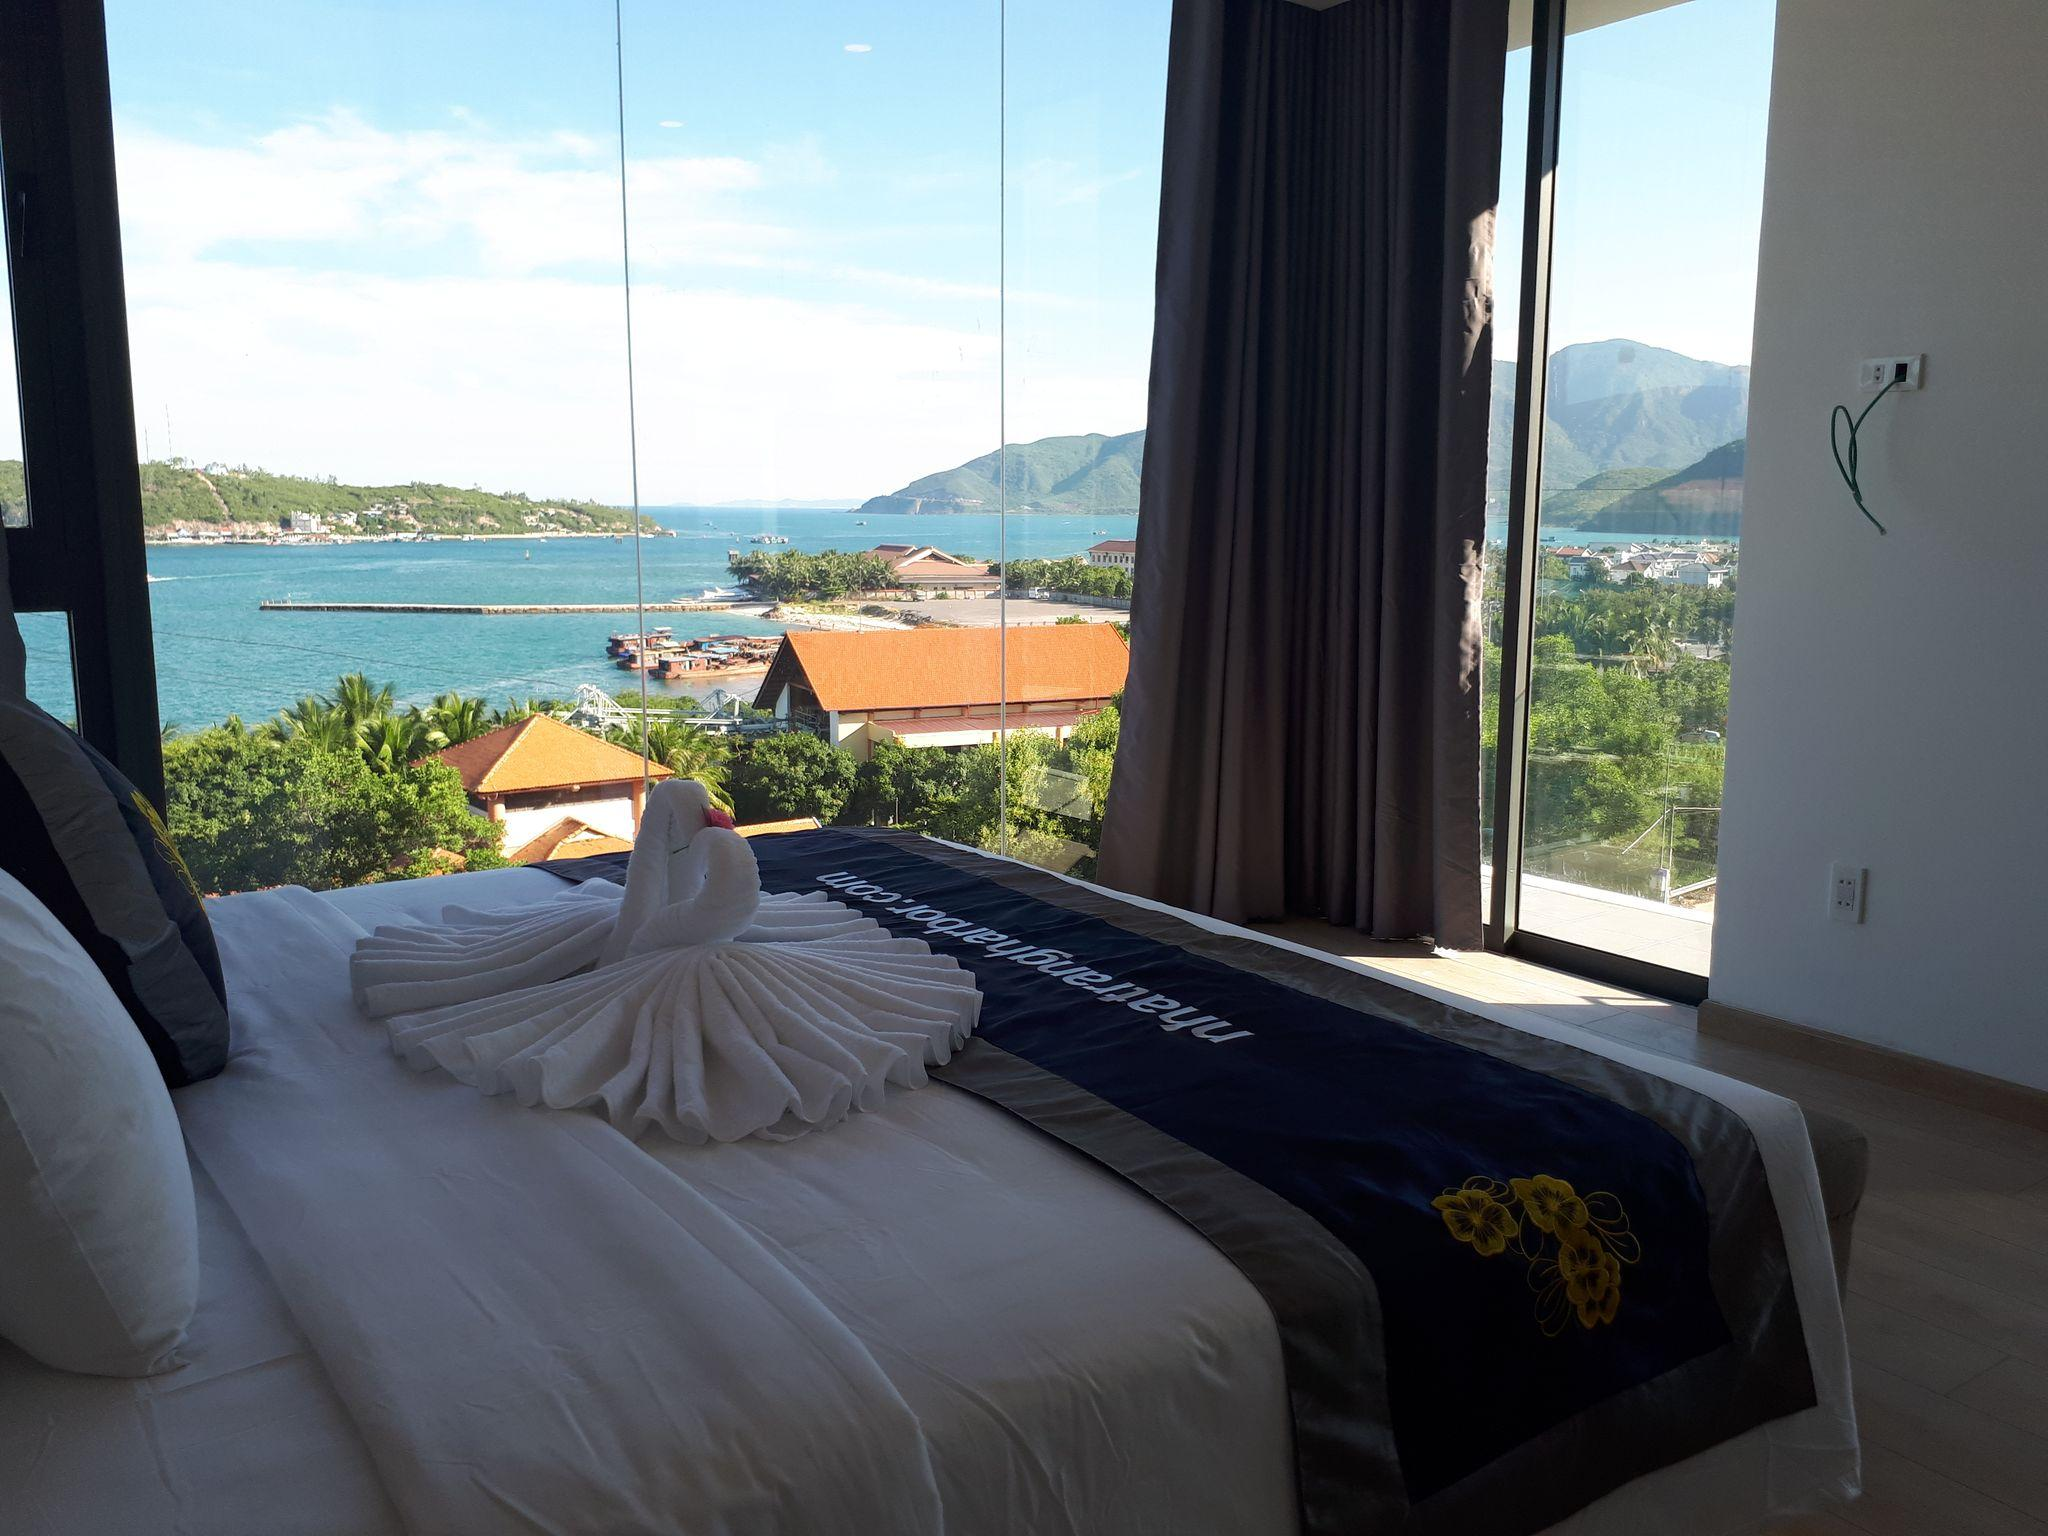 Nha Trang Harbor 3 Bedrooms Studio 1